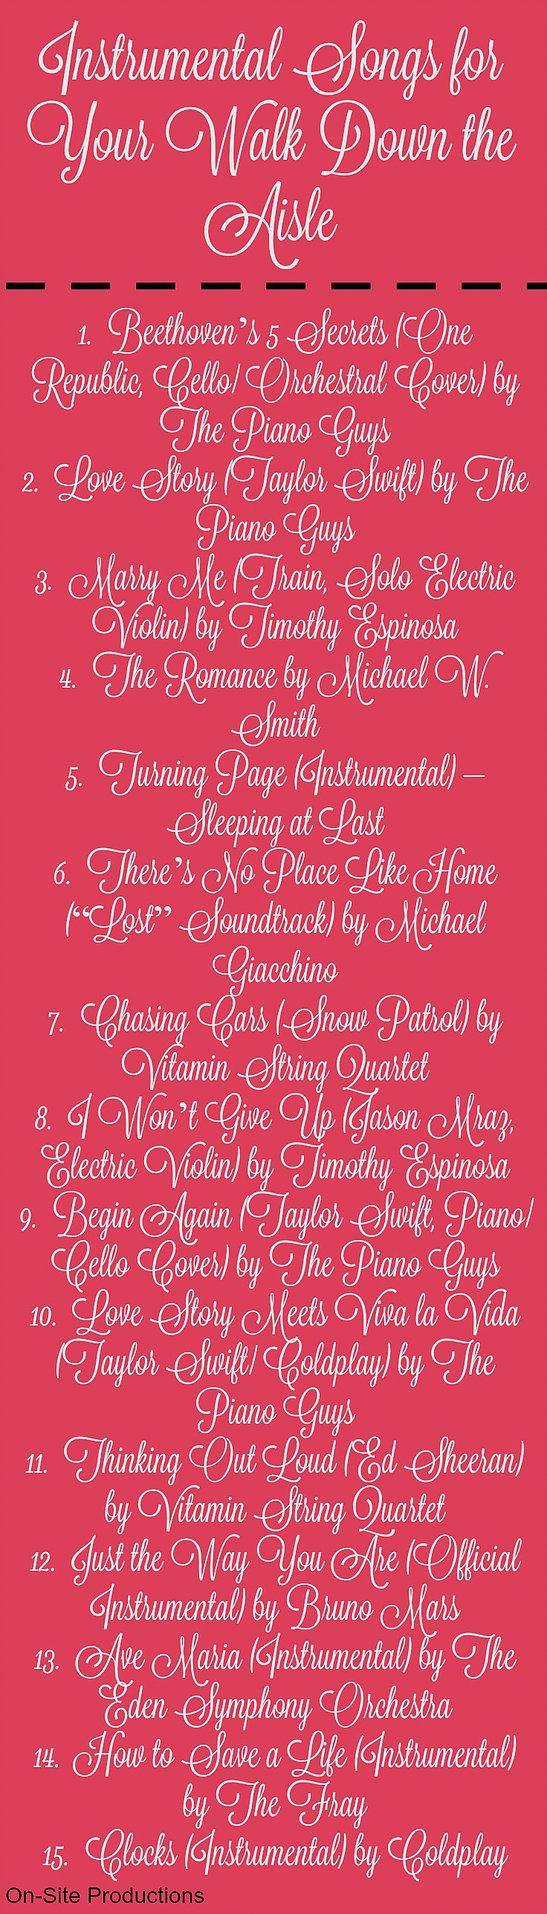 OnSite Wedding Receptions 15 Beautiful Instrumental